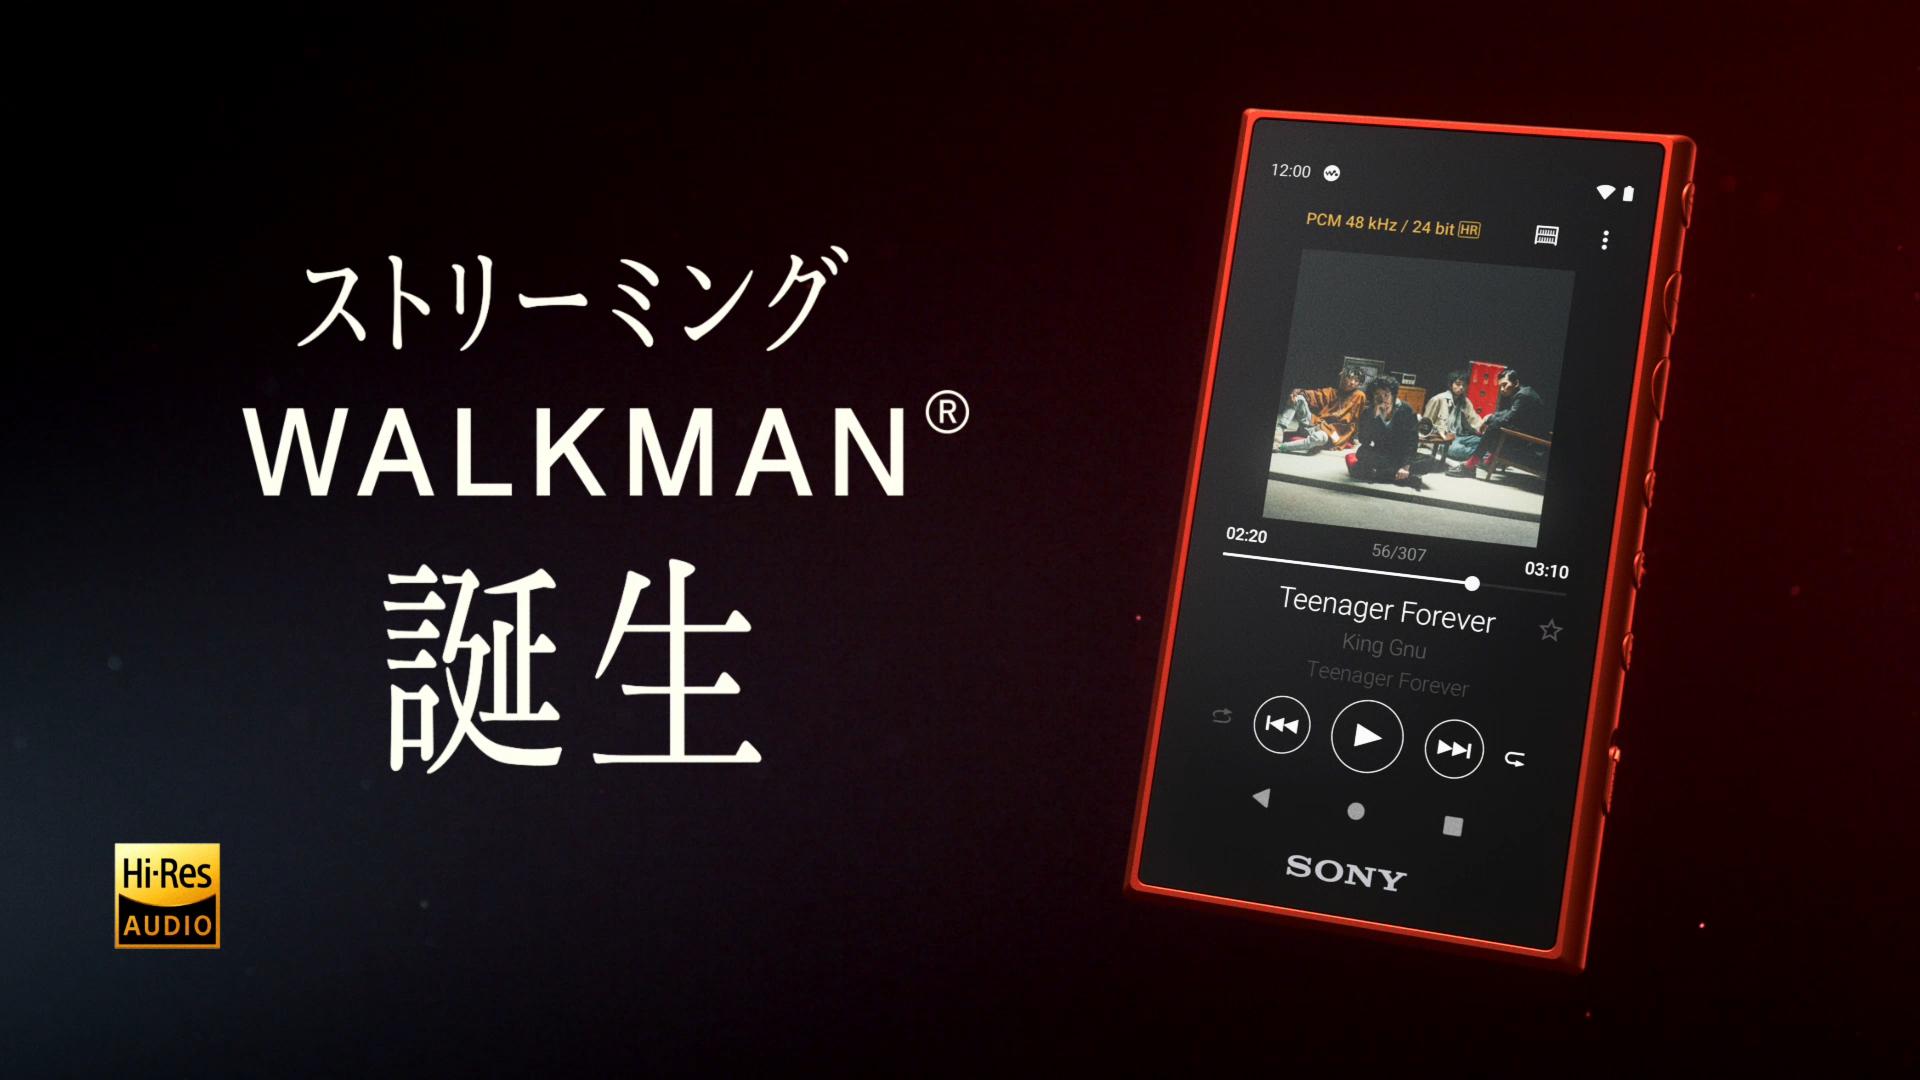 Sonyよりストリーミングサービス対応ウォークマンnw Zx500 A100シリーズ発売